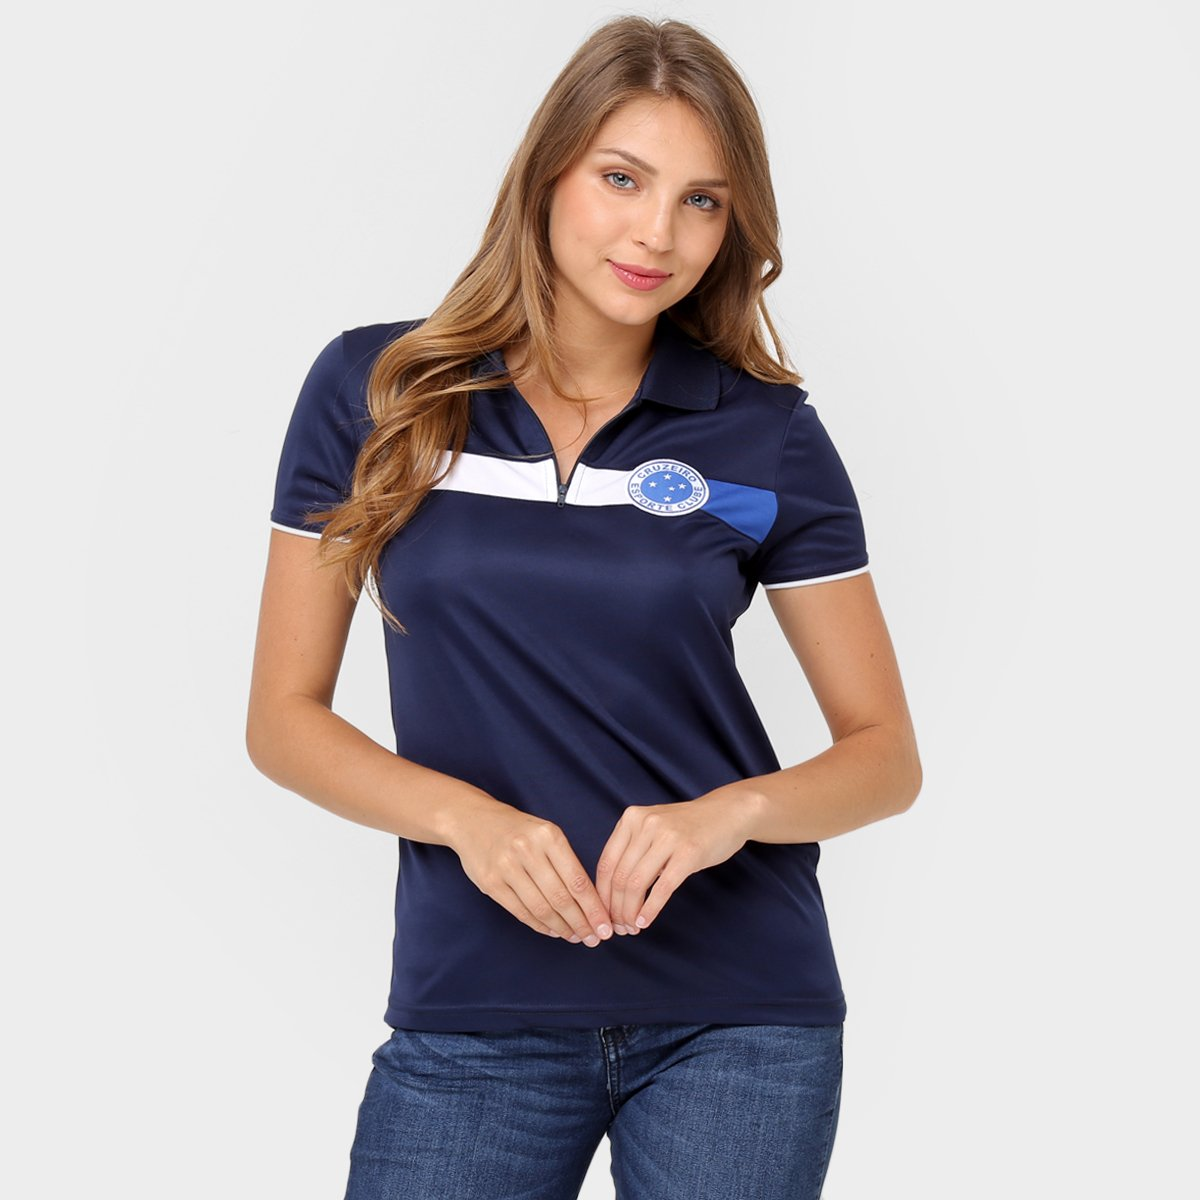 Camisa Polo Feminina Cruzeiro Mask 2 - Compre Agora  a64995250ef0b